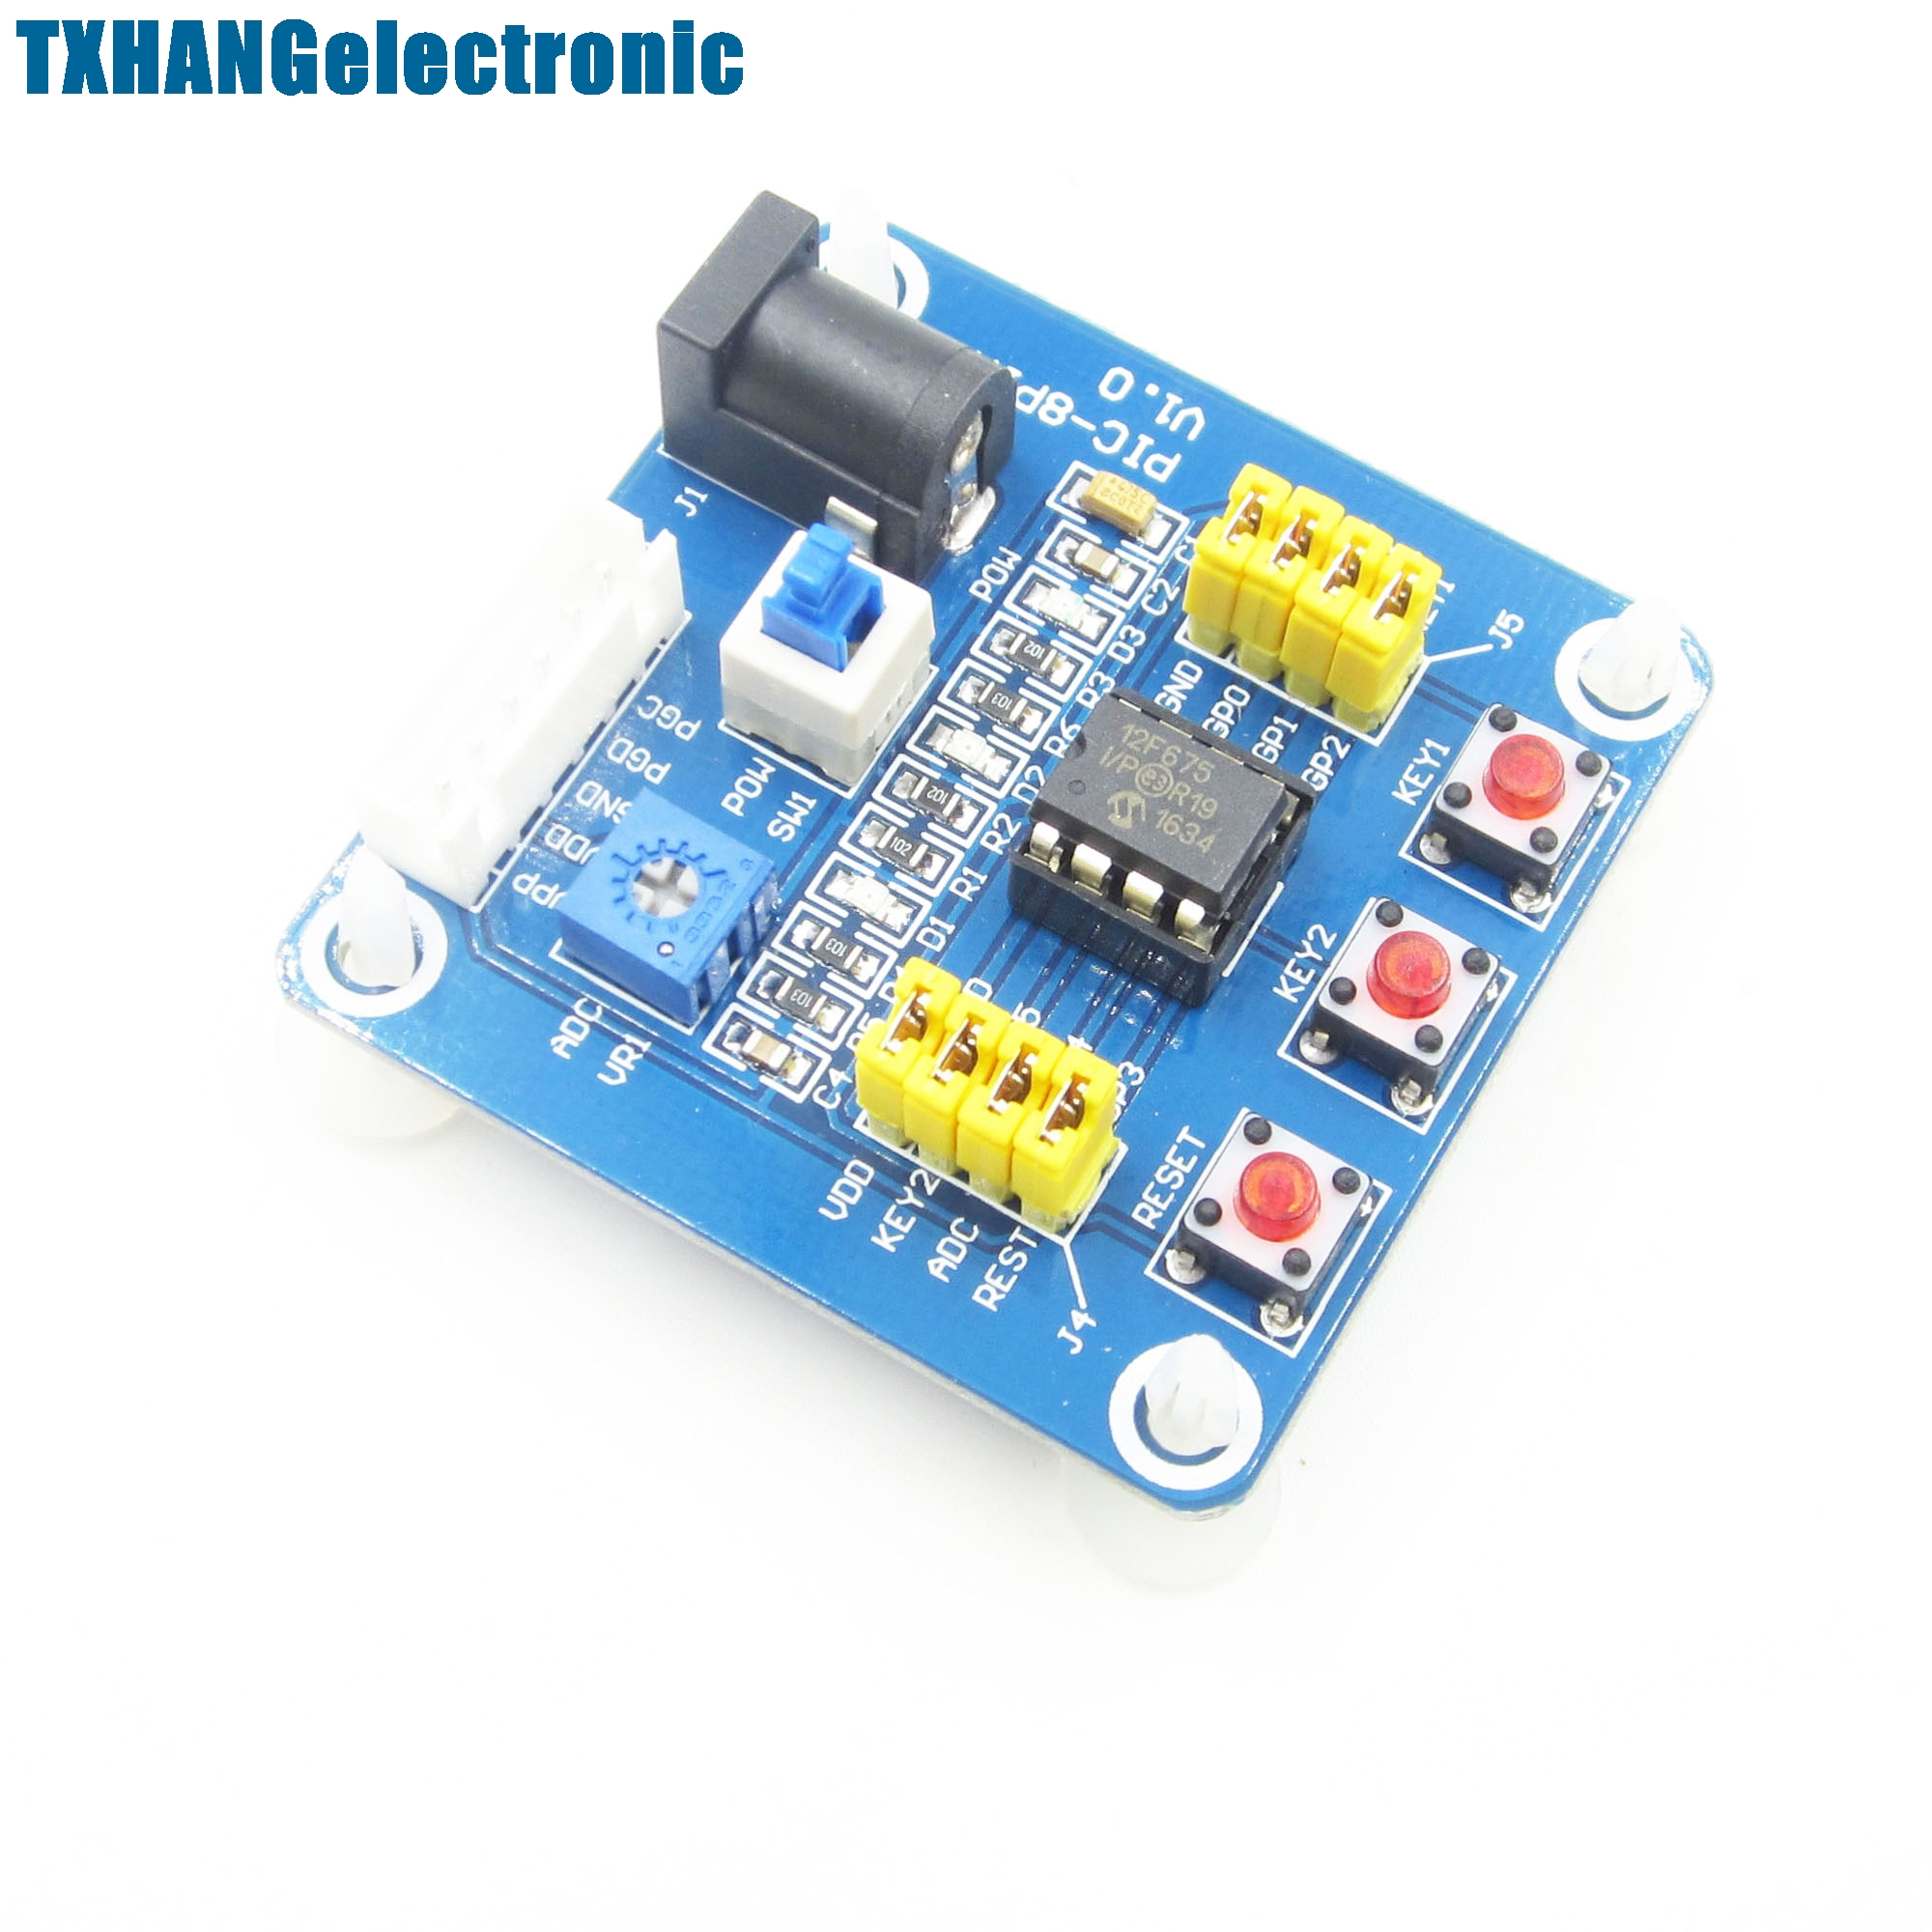 PIC12F675 Development Board Microchip PIC Emulator PICKit2 Debugger Programmer